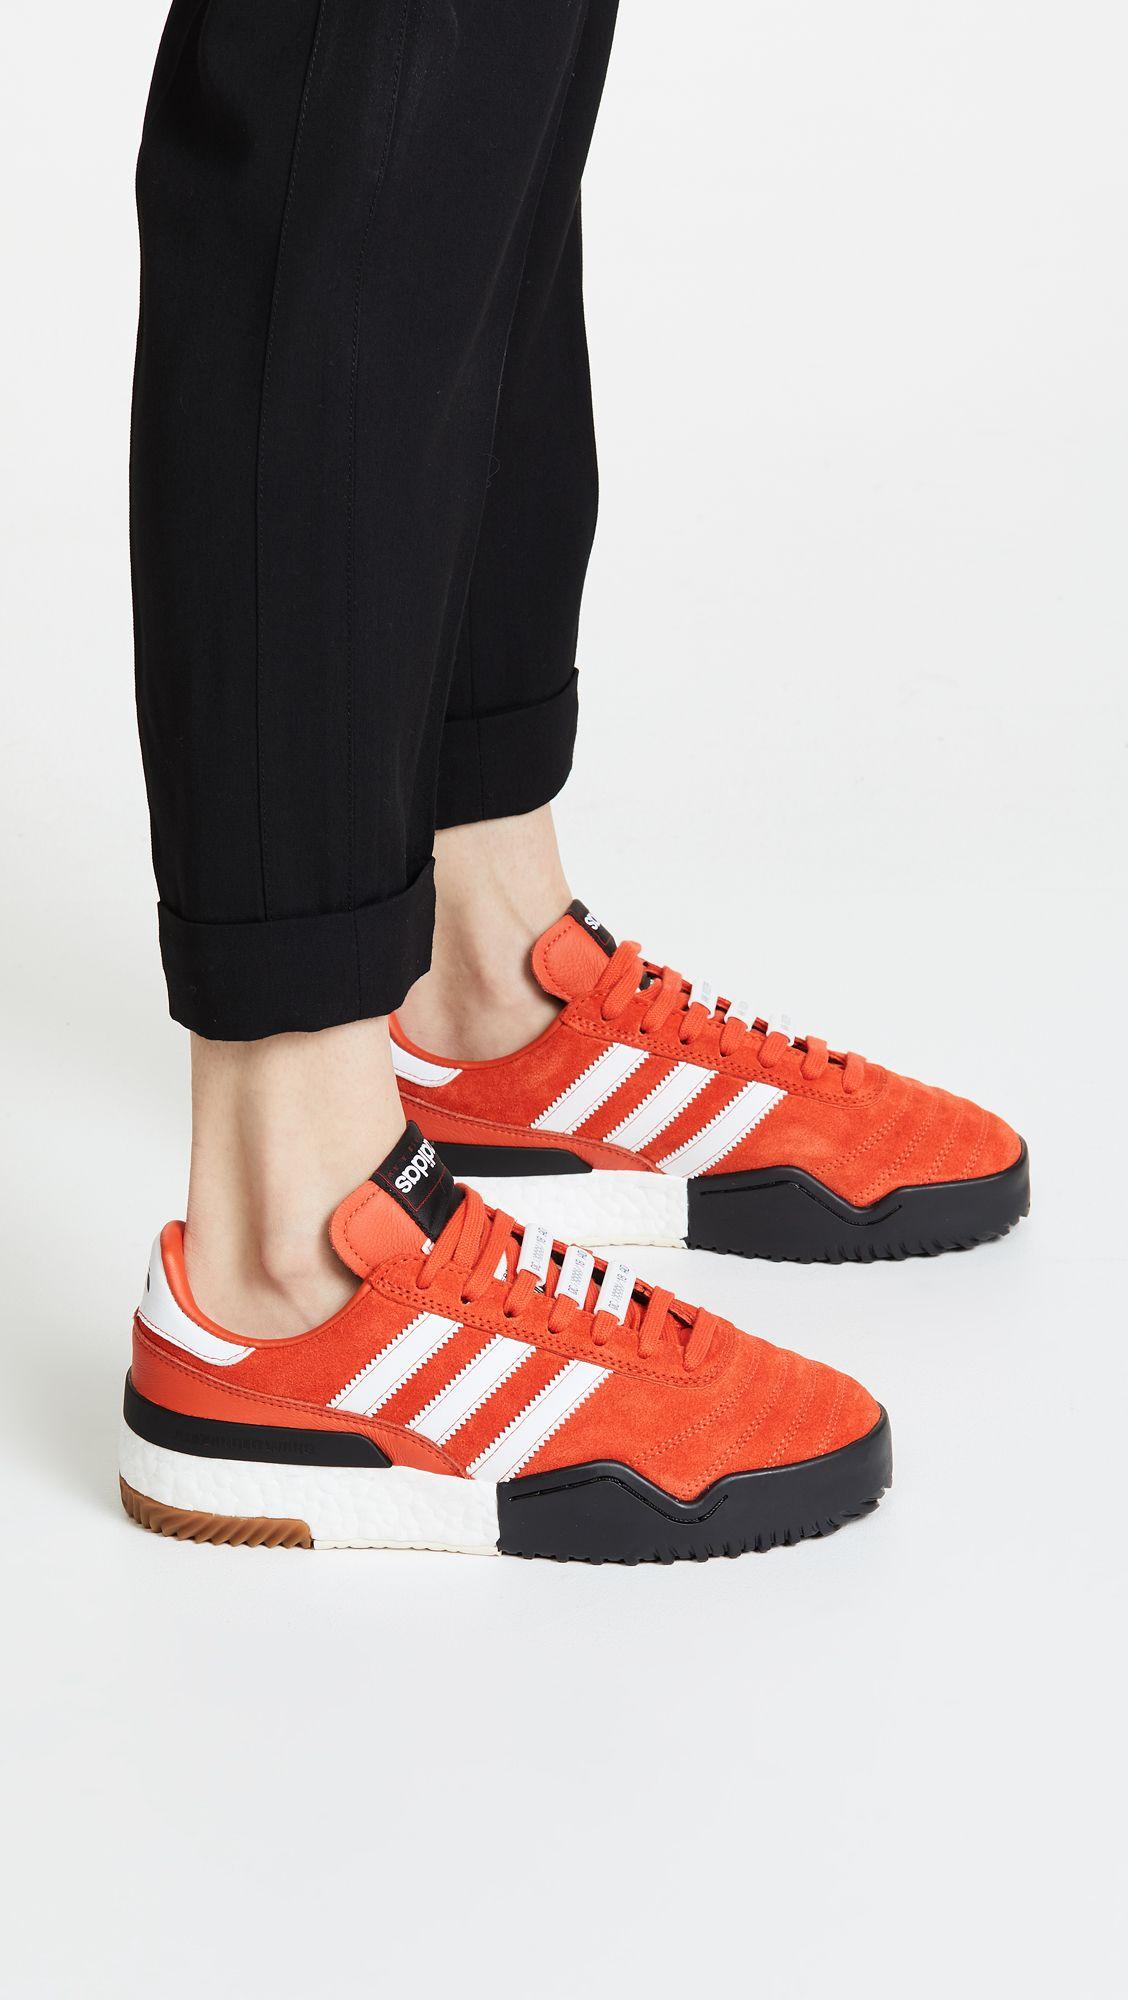 58e69cbc6 adidas Originals by Alexander Wang Sports Sneakers